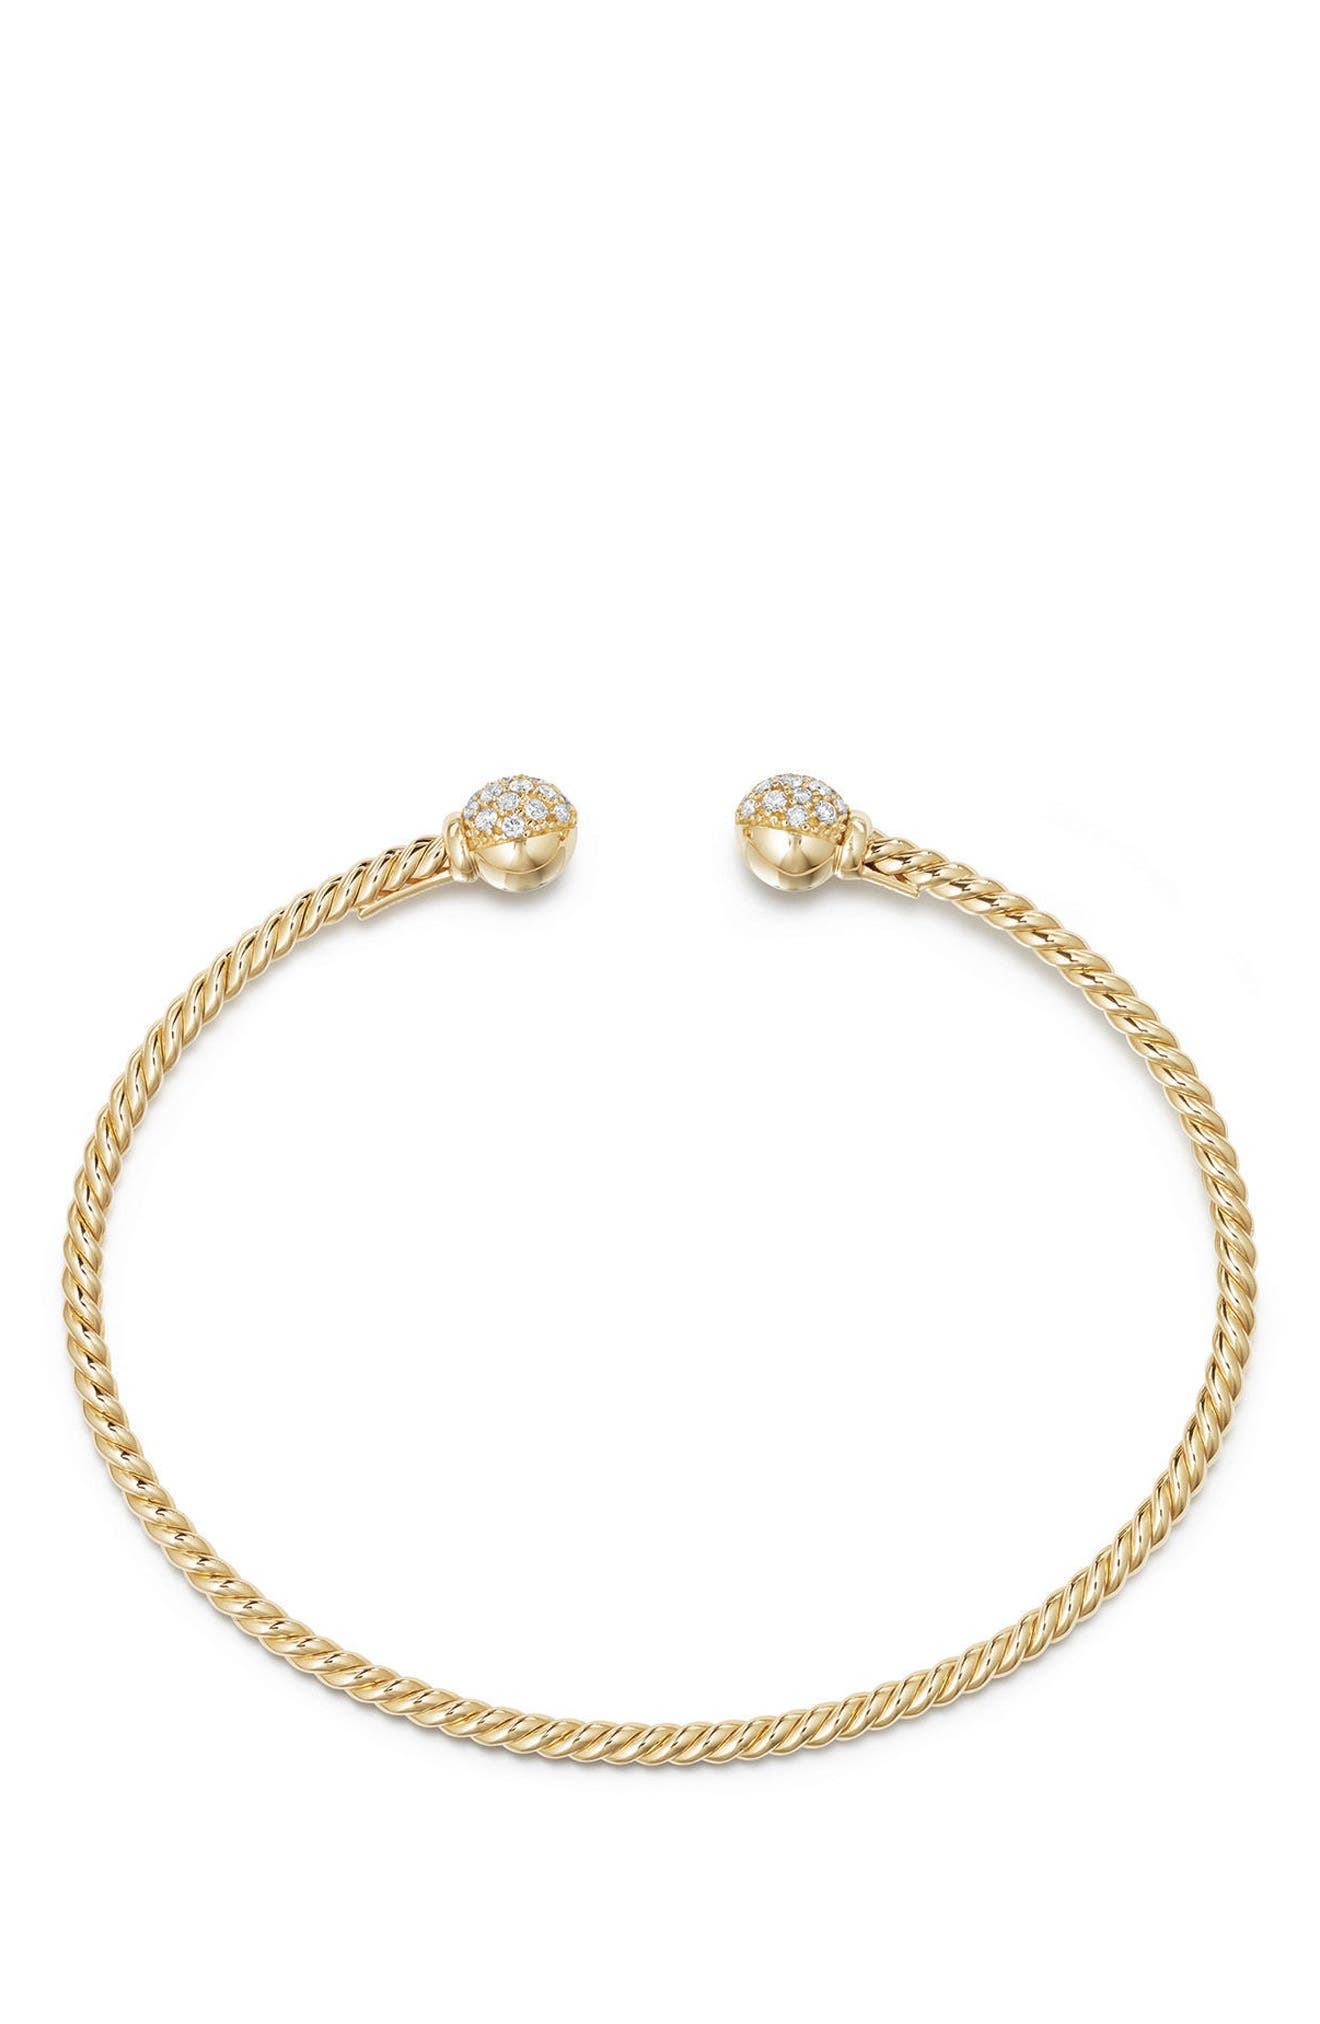 Solari Bead Bracelet with Diamonds in 18K Gold,                             Alternate thumbnail 2, color,                             Yellow Gold/ Diamond